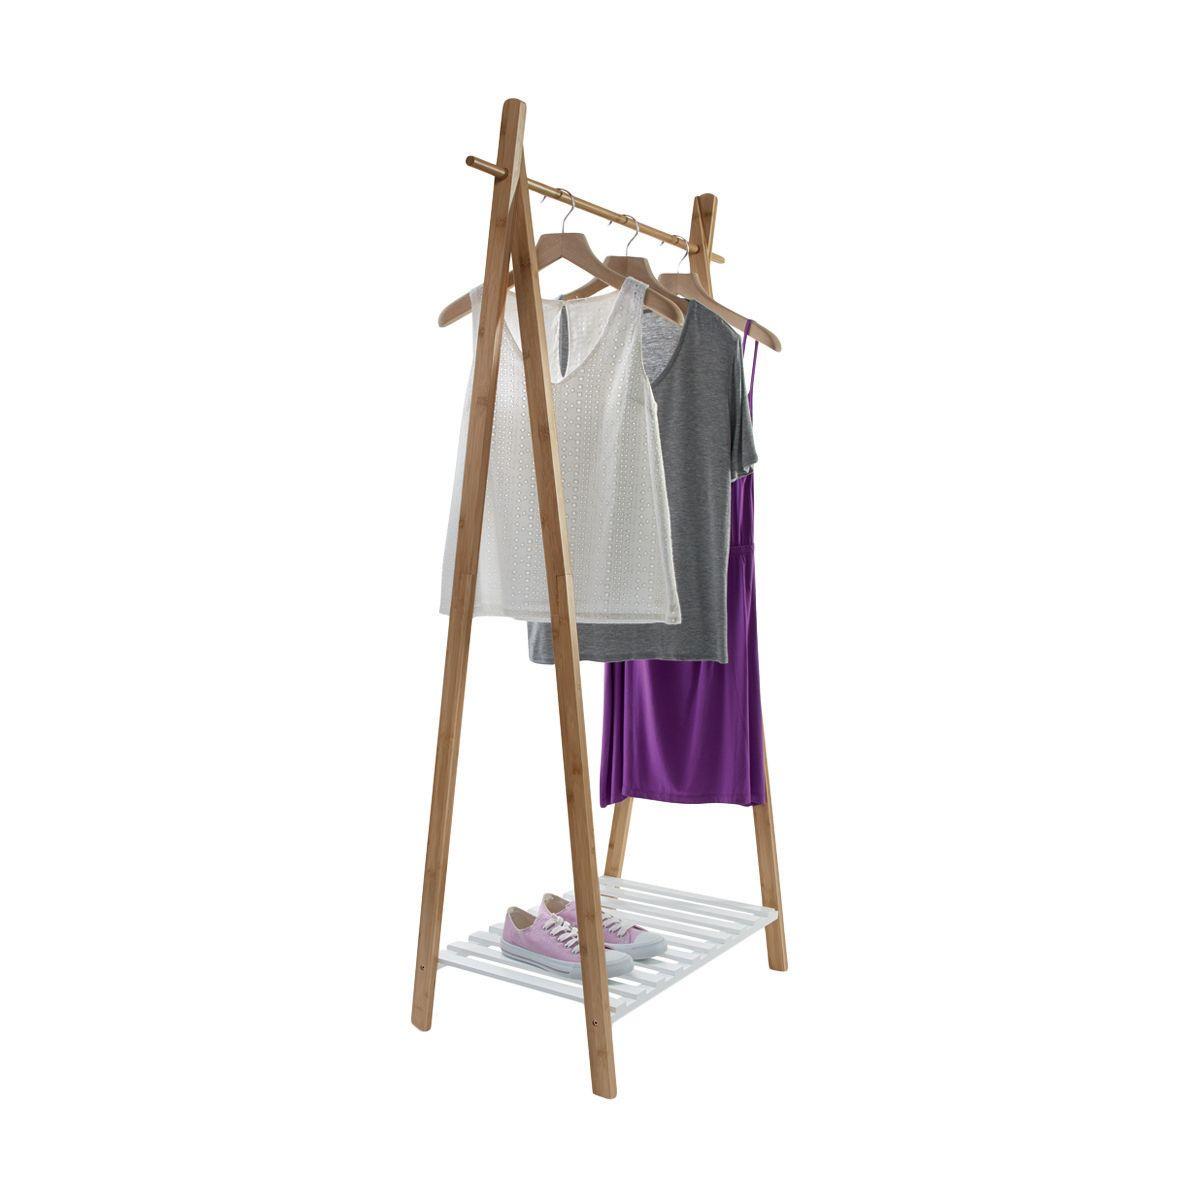 Hanging Rack Kmart Clothing Rack Bedroom Diy Clothes Rack Clothing Rack